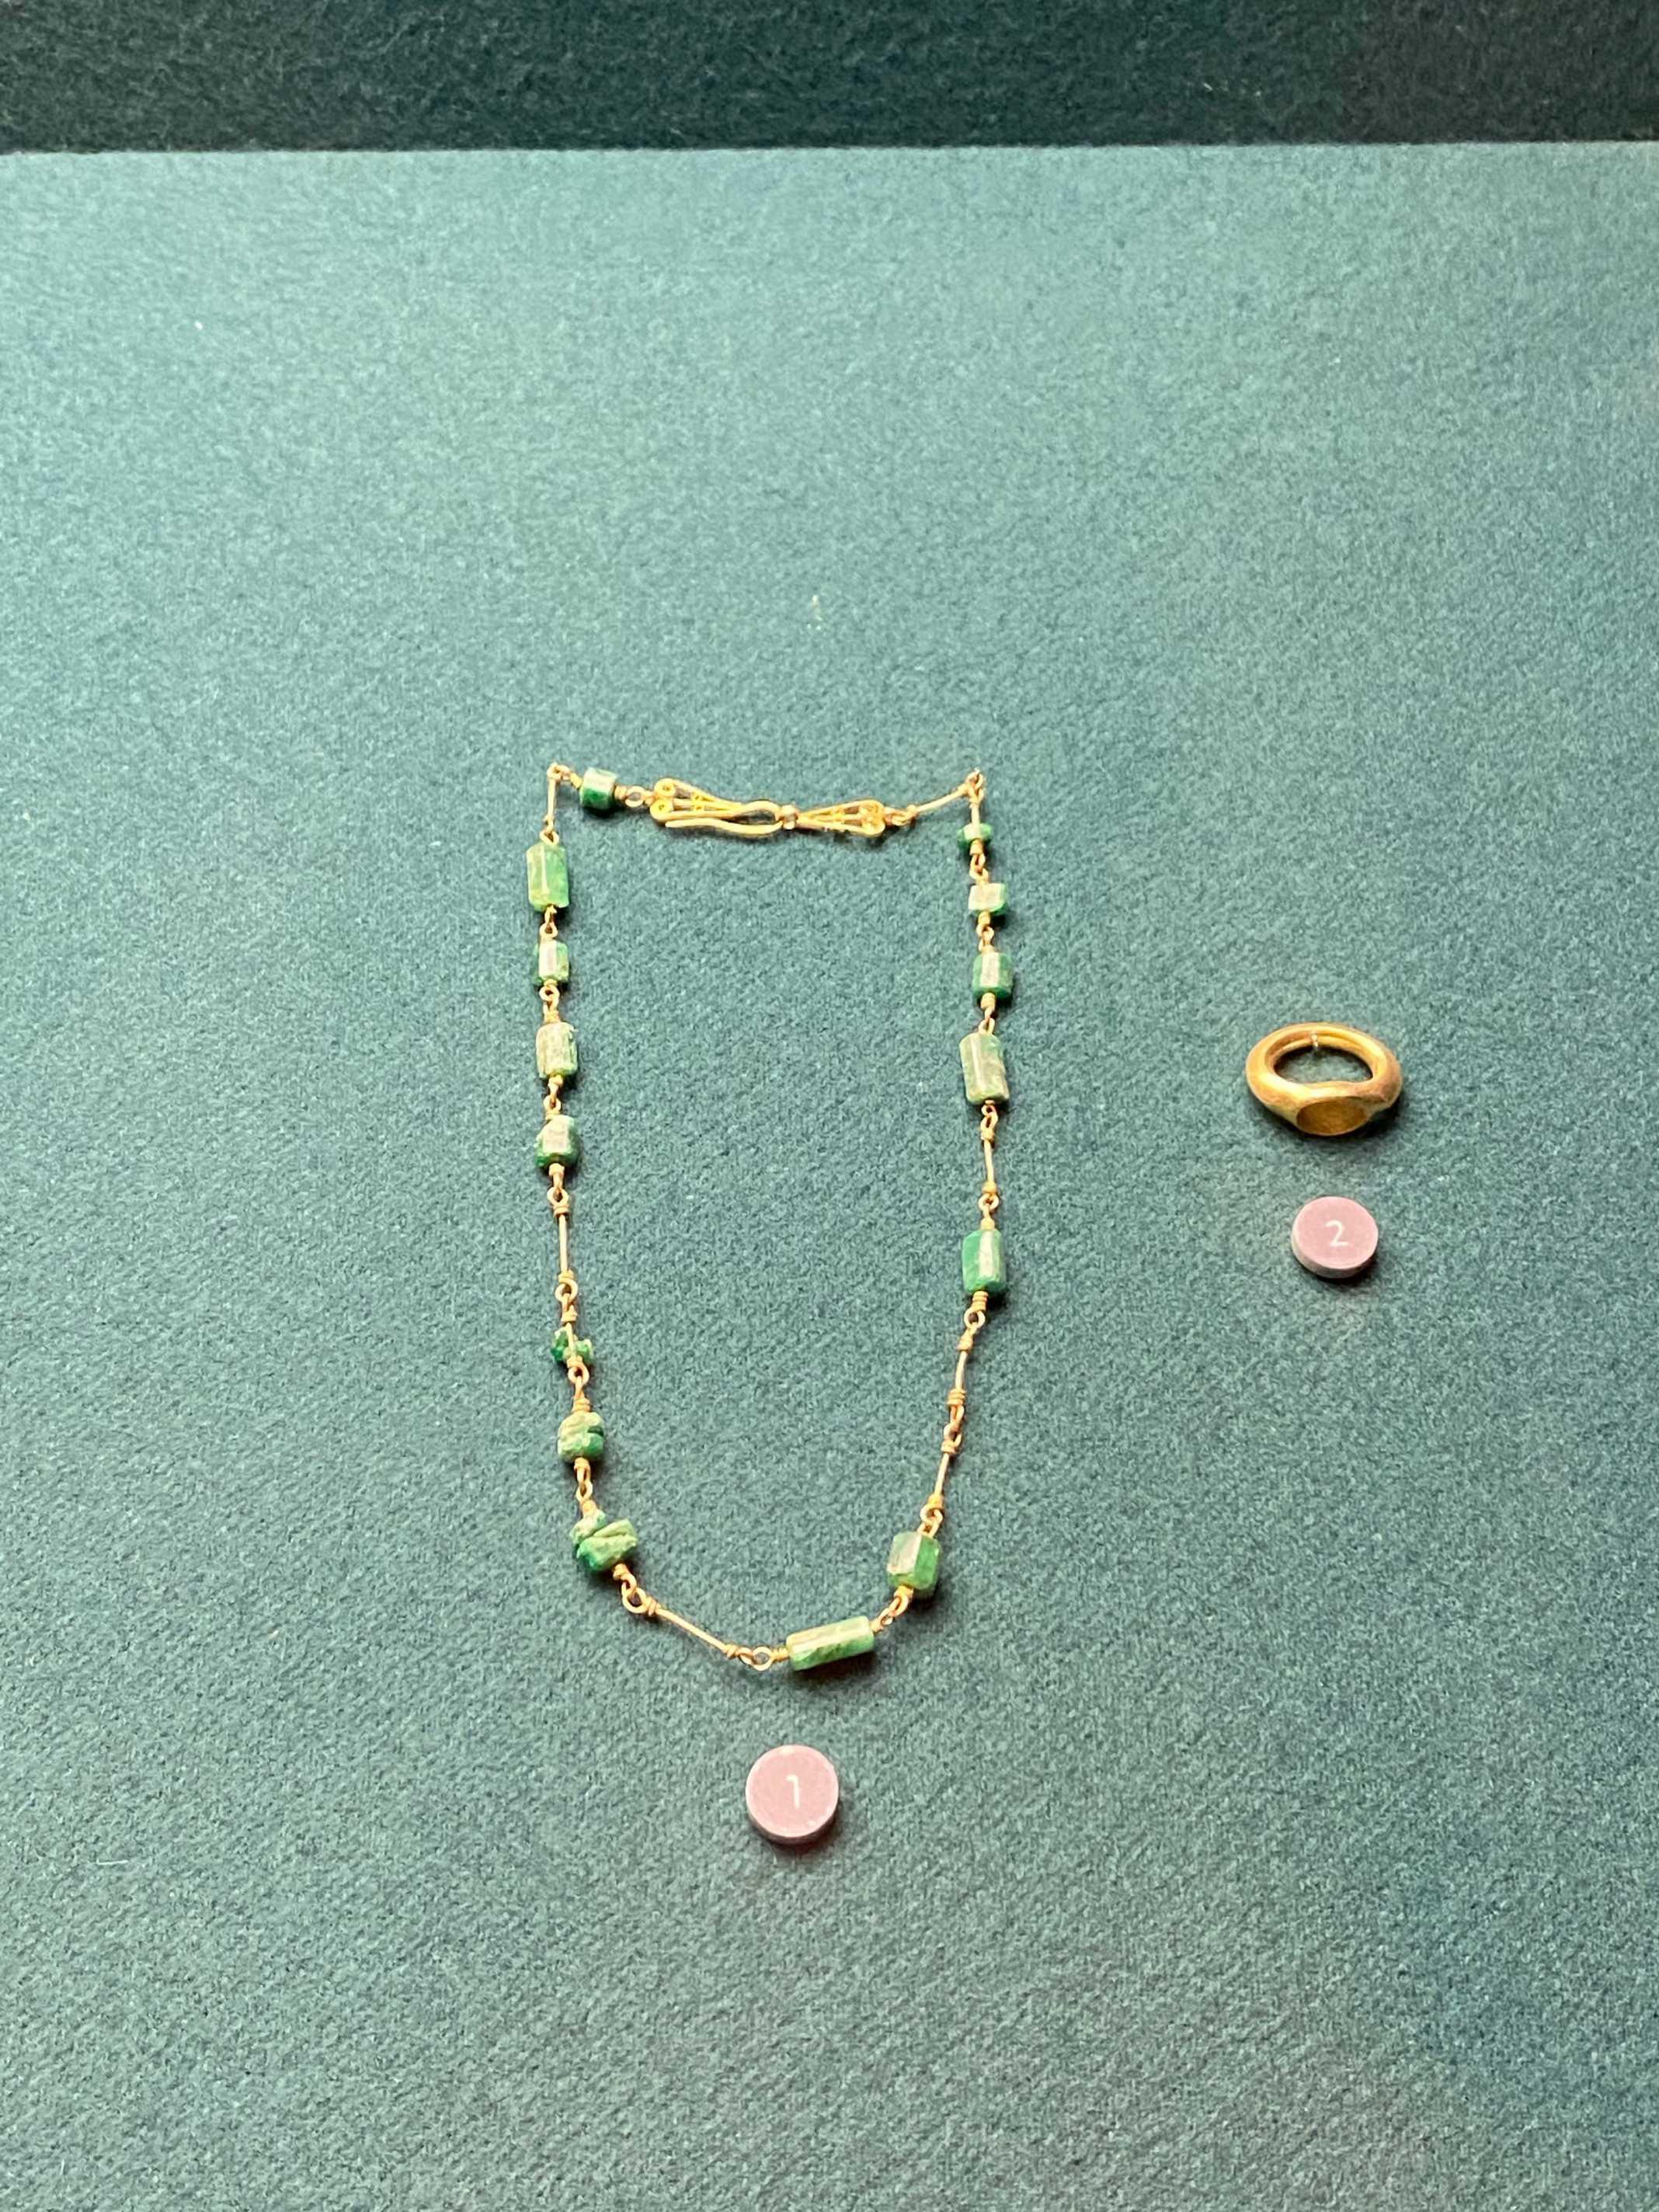 museu arqueologia lisboa joias